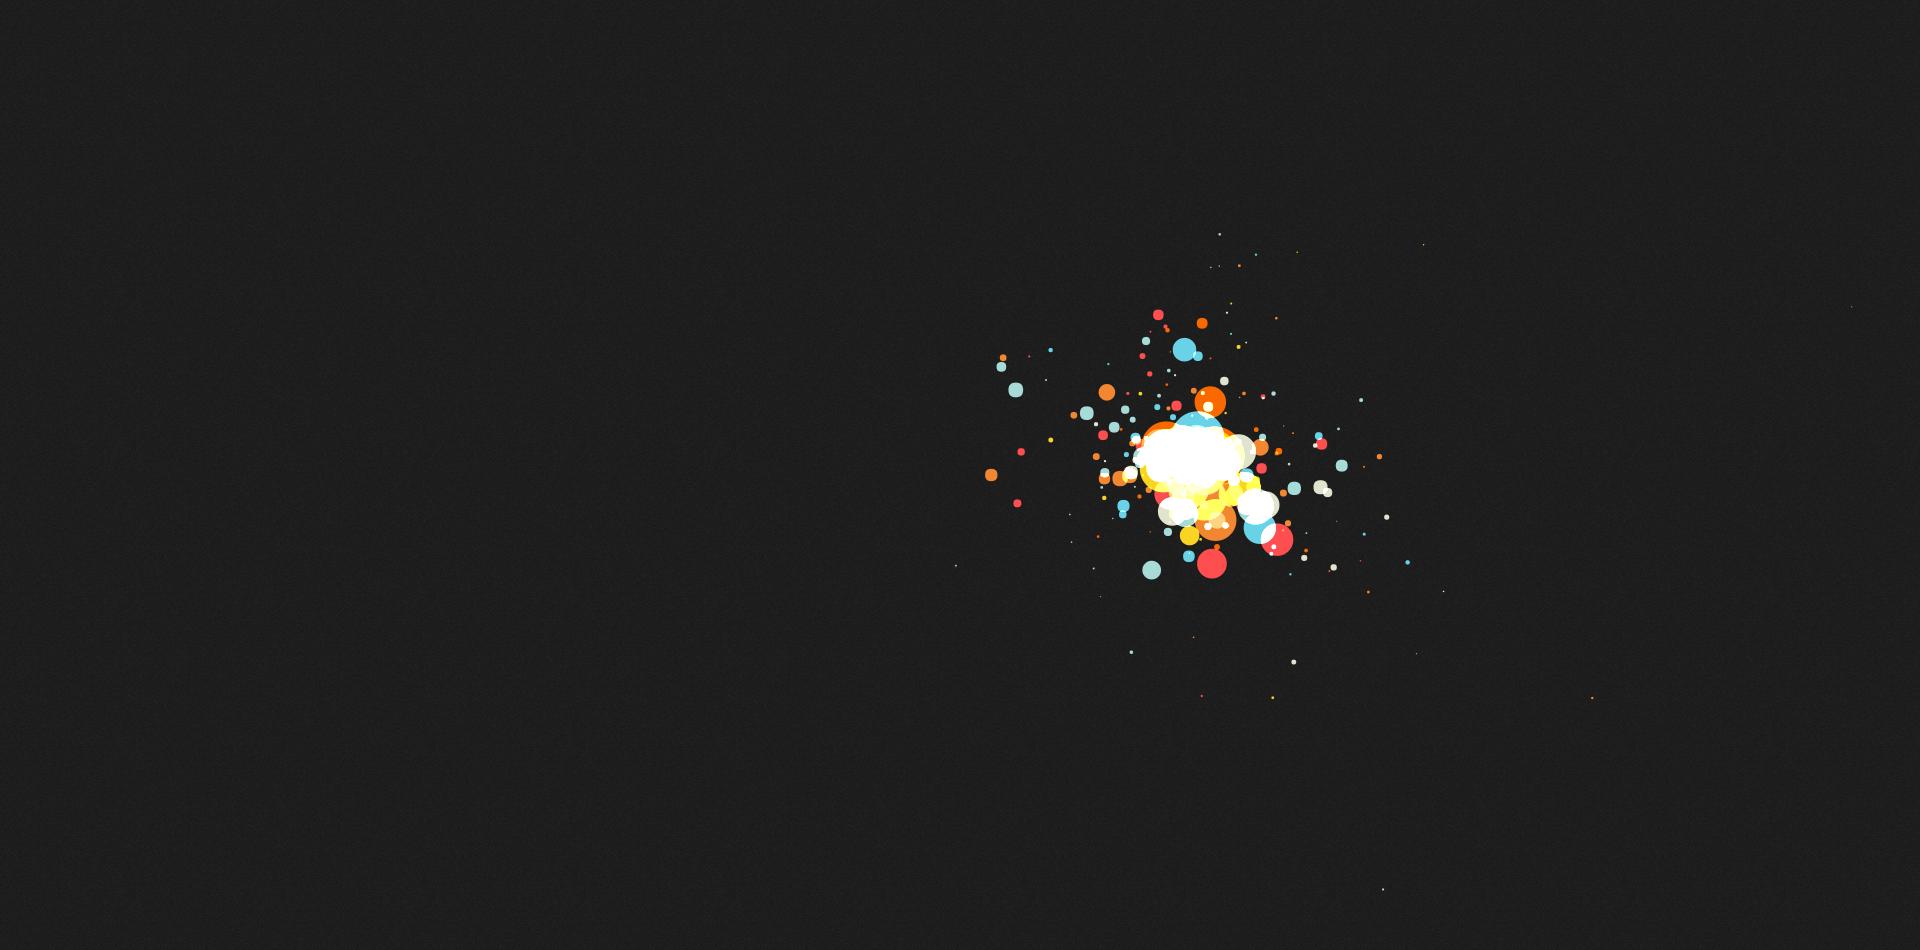 canvas鼠标追随粒子放射效果